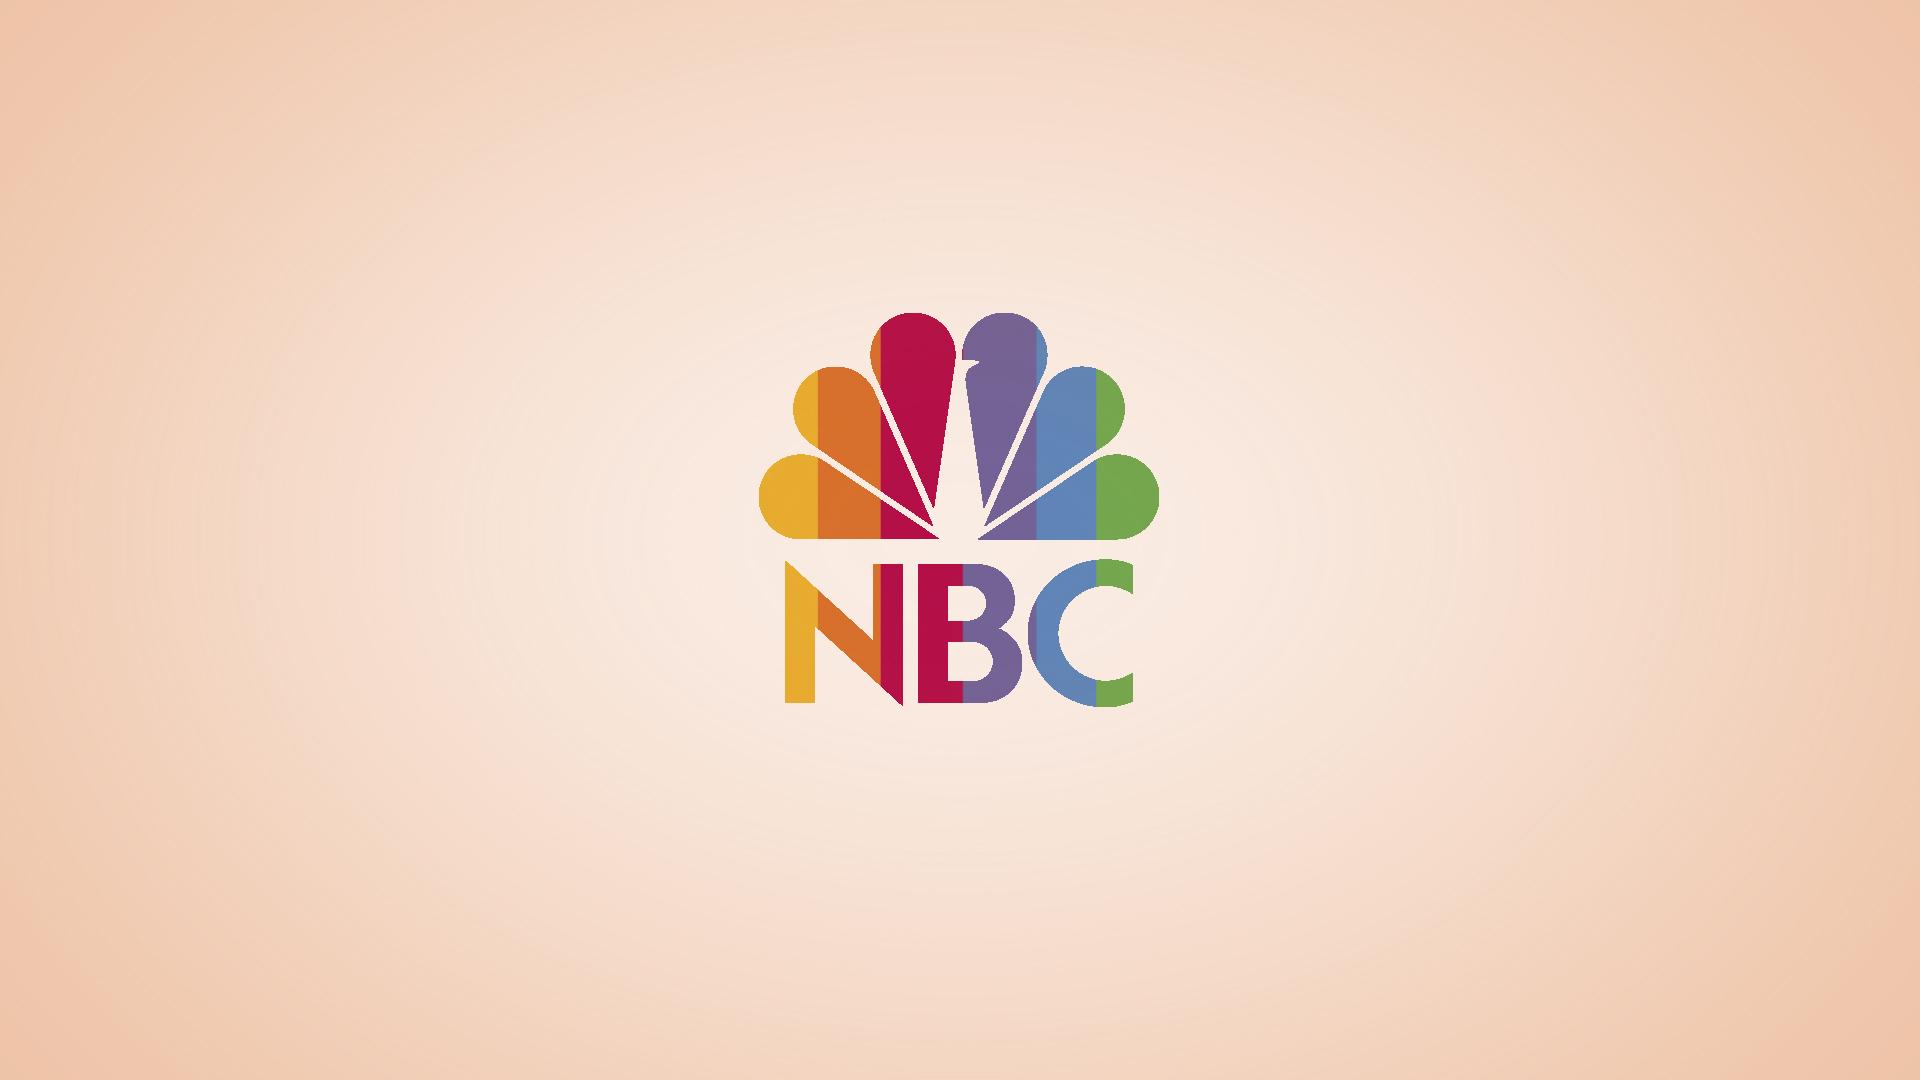 NBCLOGO.jpg